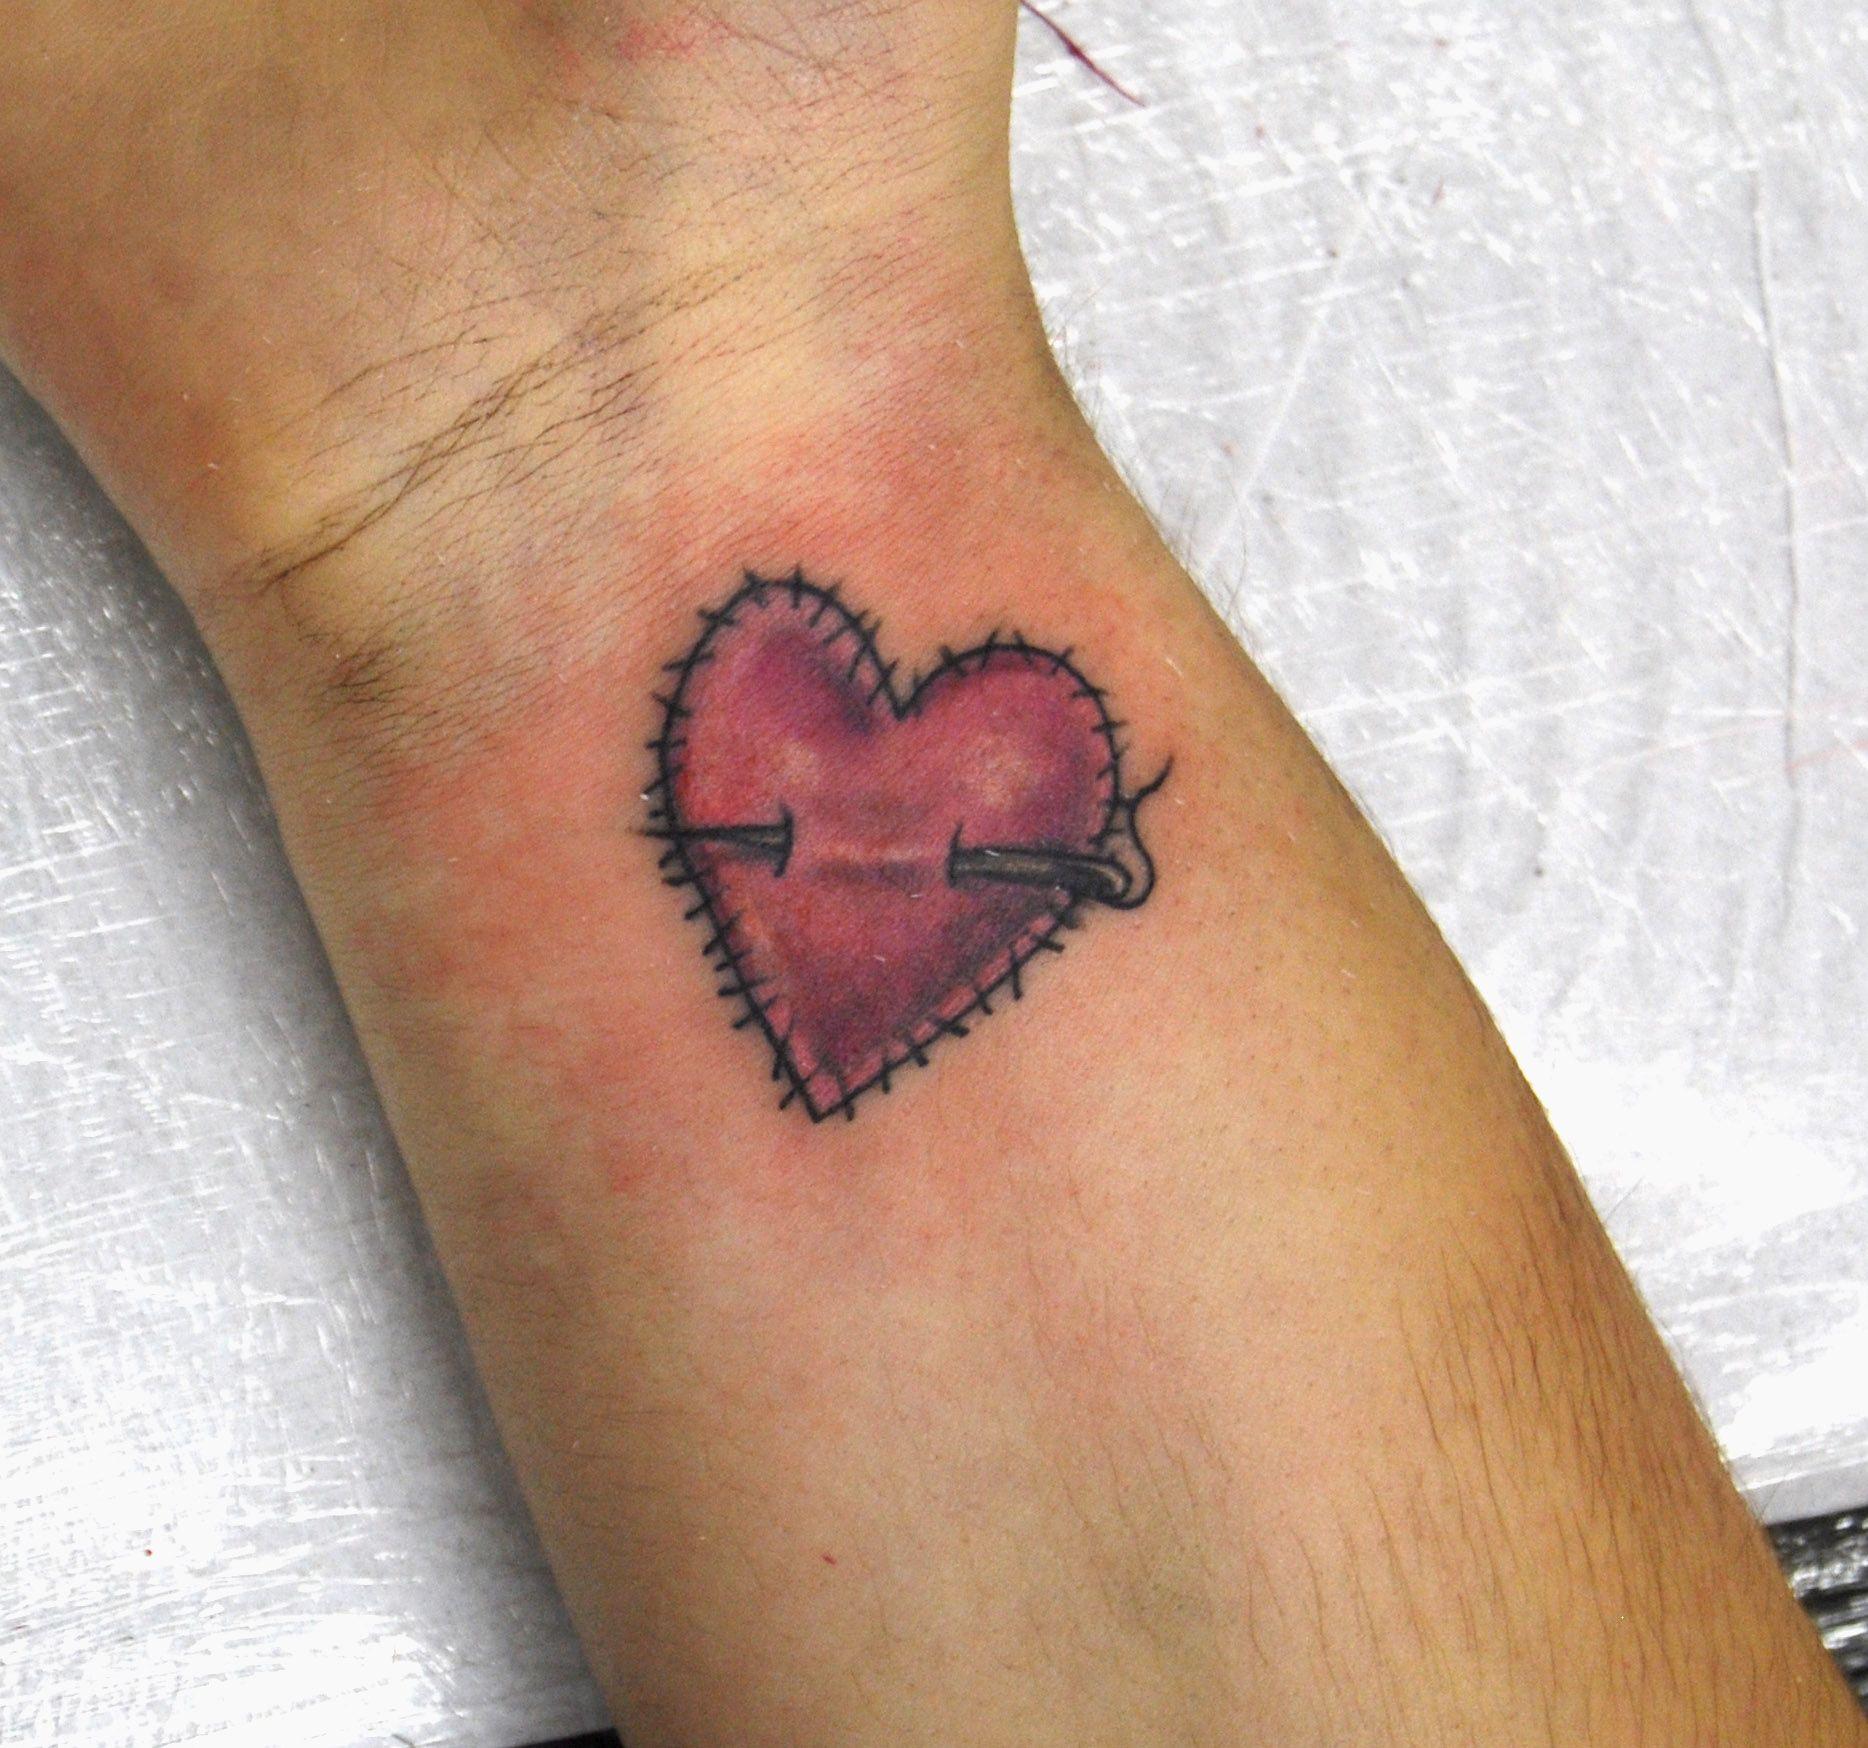 Love heart symbol with hands tatt pinterest tatt love heart symbol with hands small heart tattoosheart buycottarizona